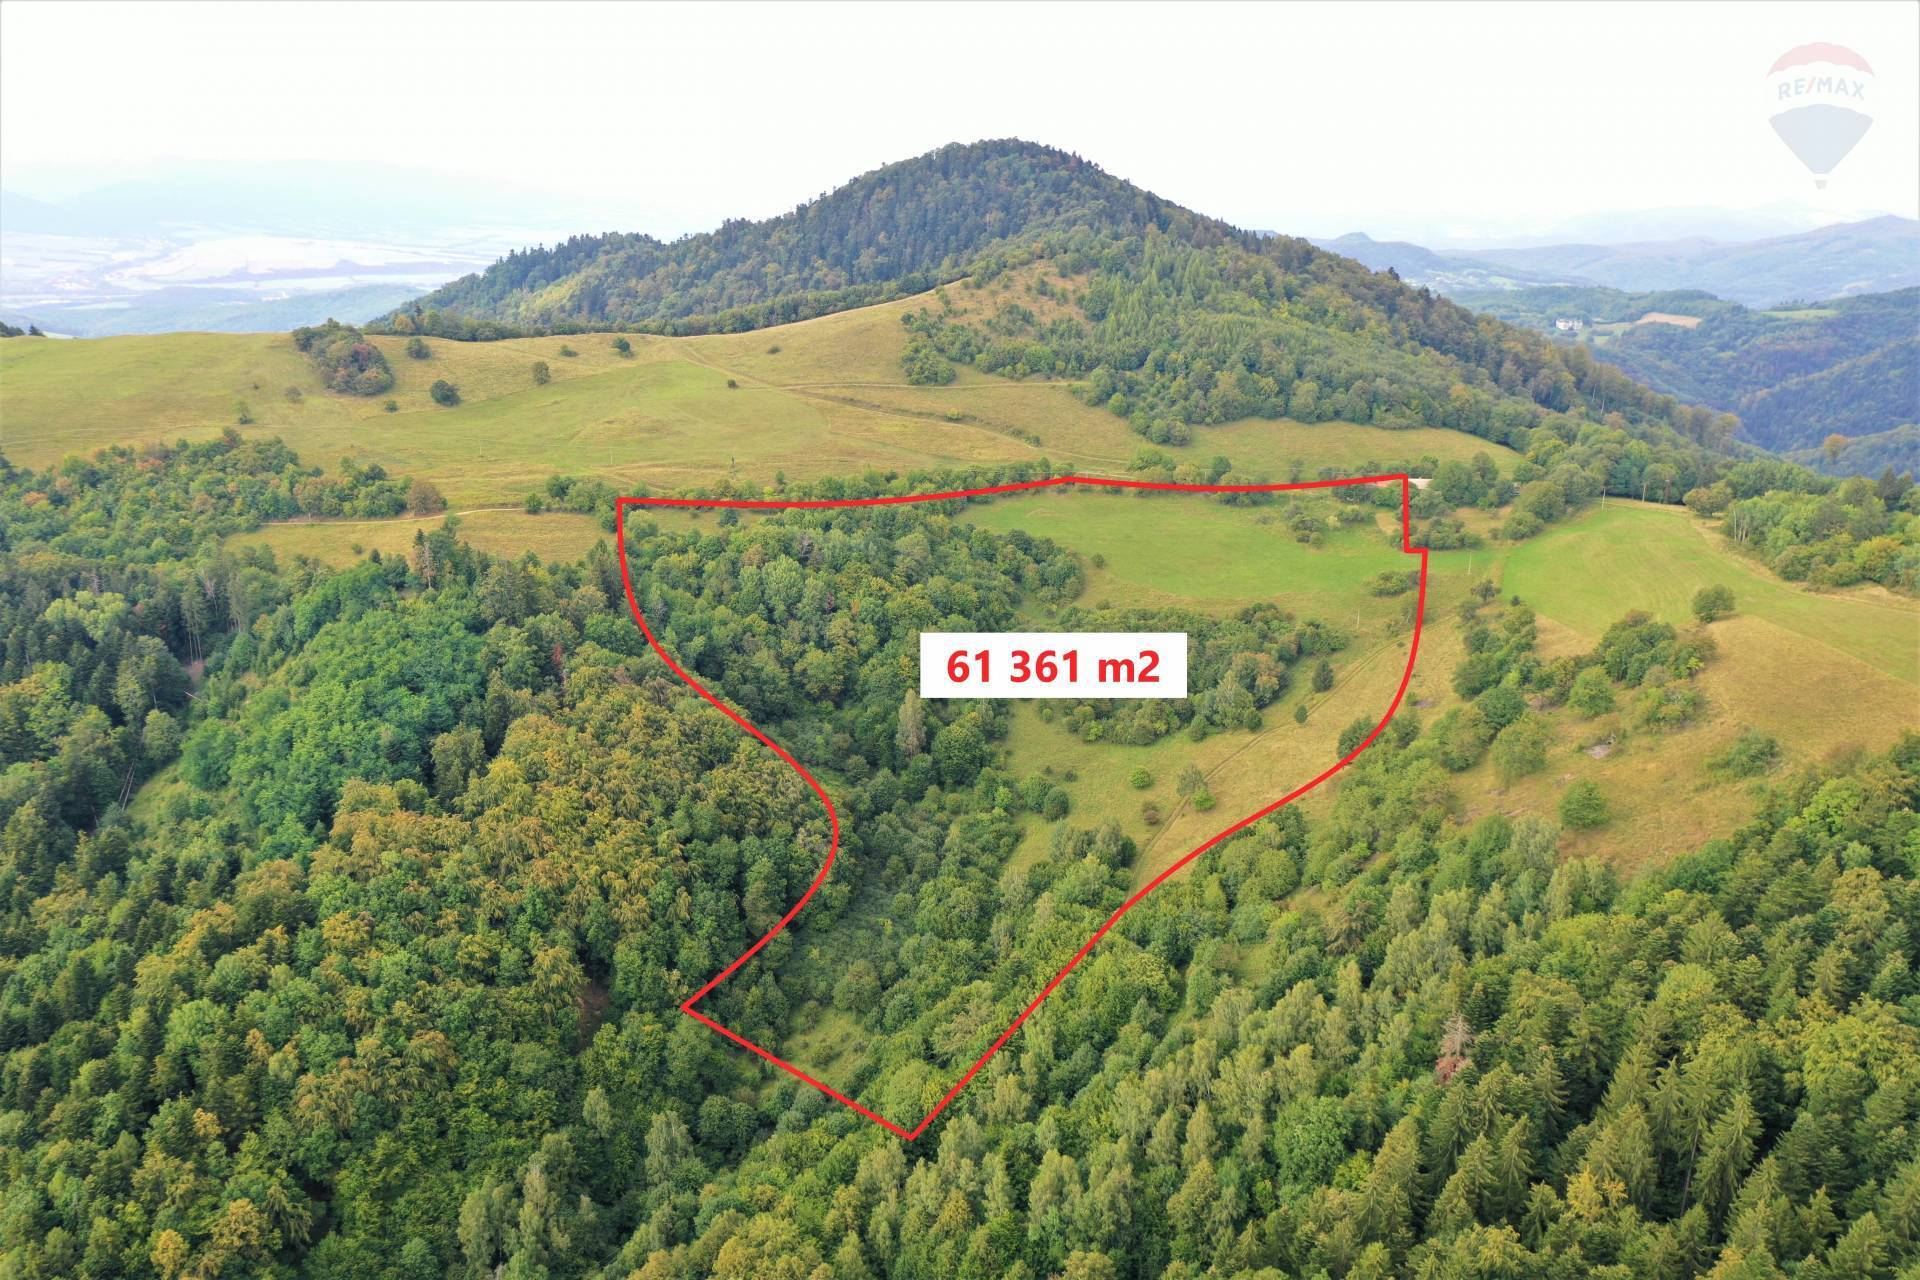 Predaj pozemku 61361 m2, Hodruša-Hámre -